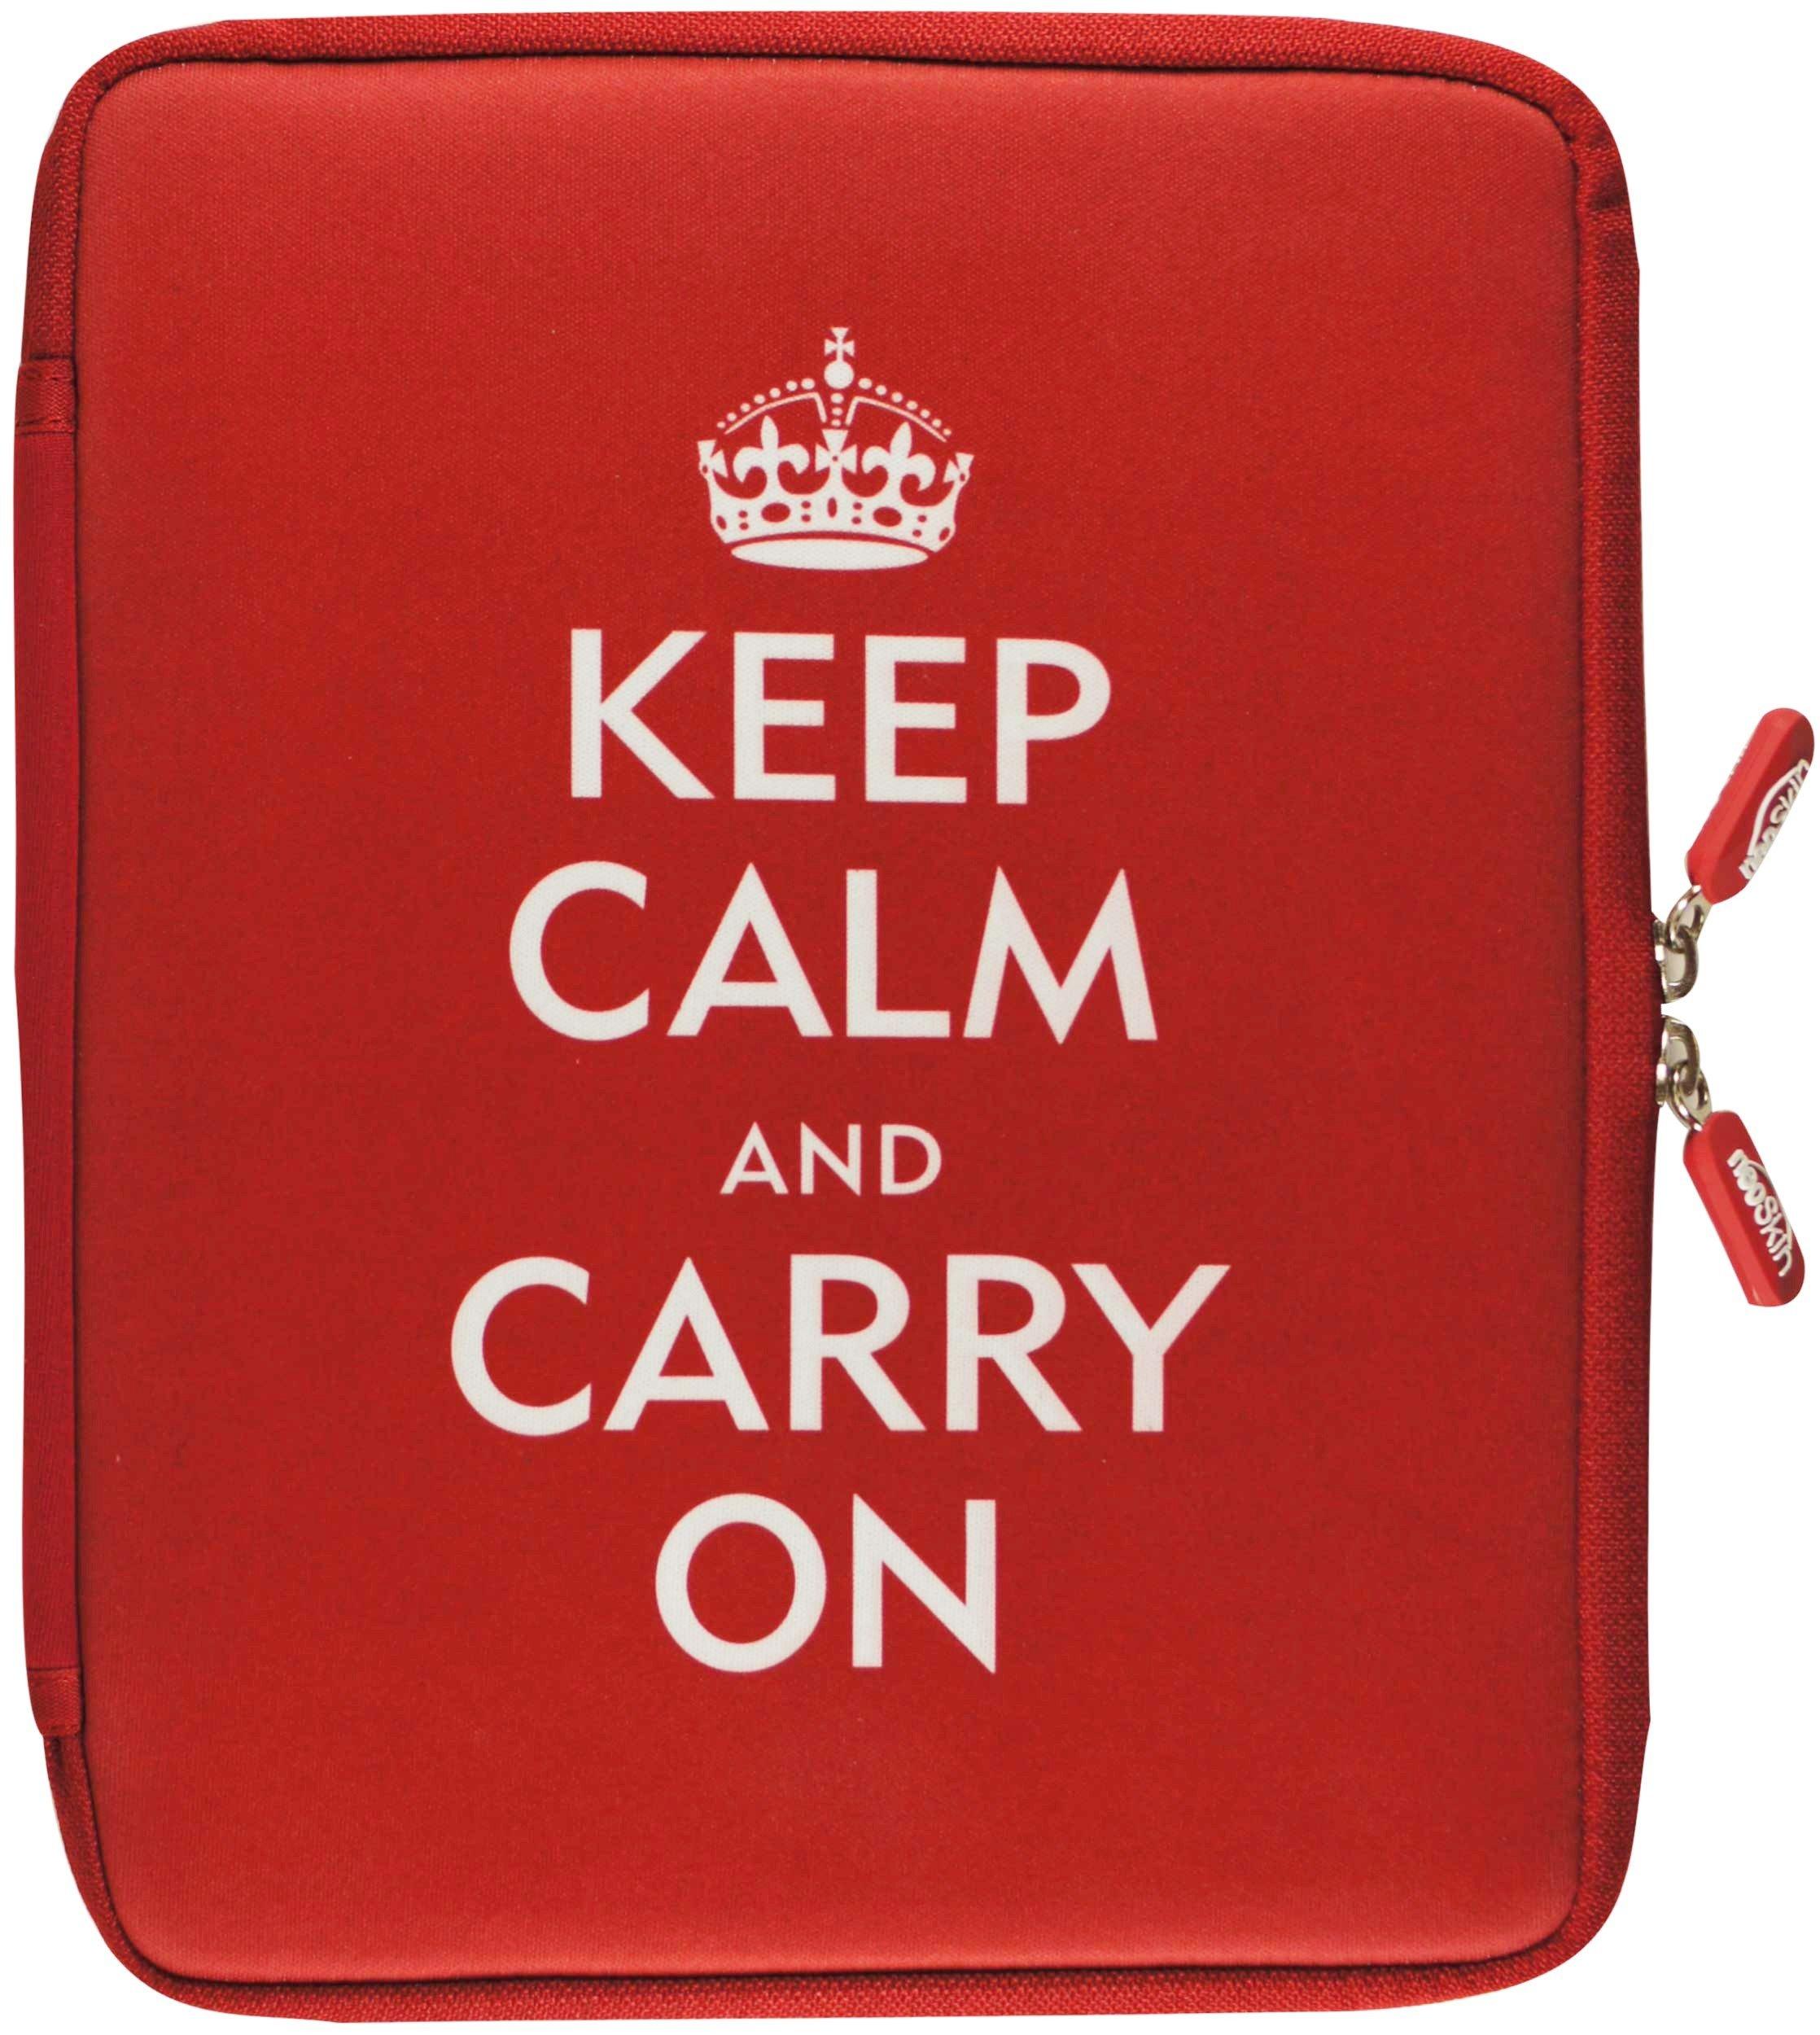 Read Online NeoSkin iPad Zip Sleeve, Keep Calm and Carry On (fits iPad 2 and new iPad) (Neoprene iPad Cover, iPad Case) pdf